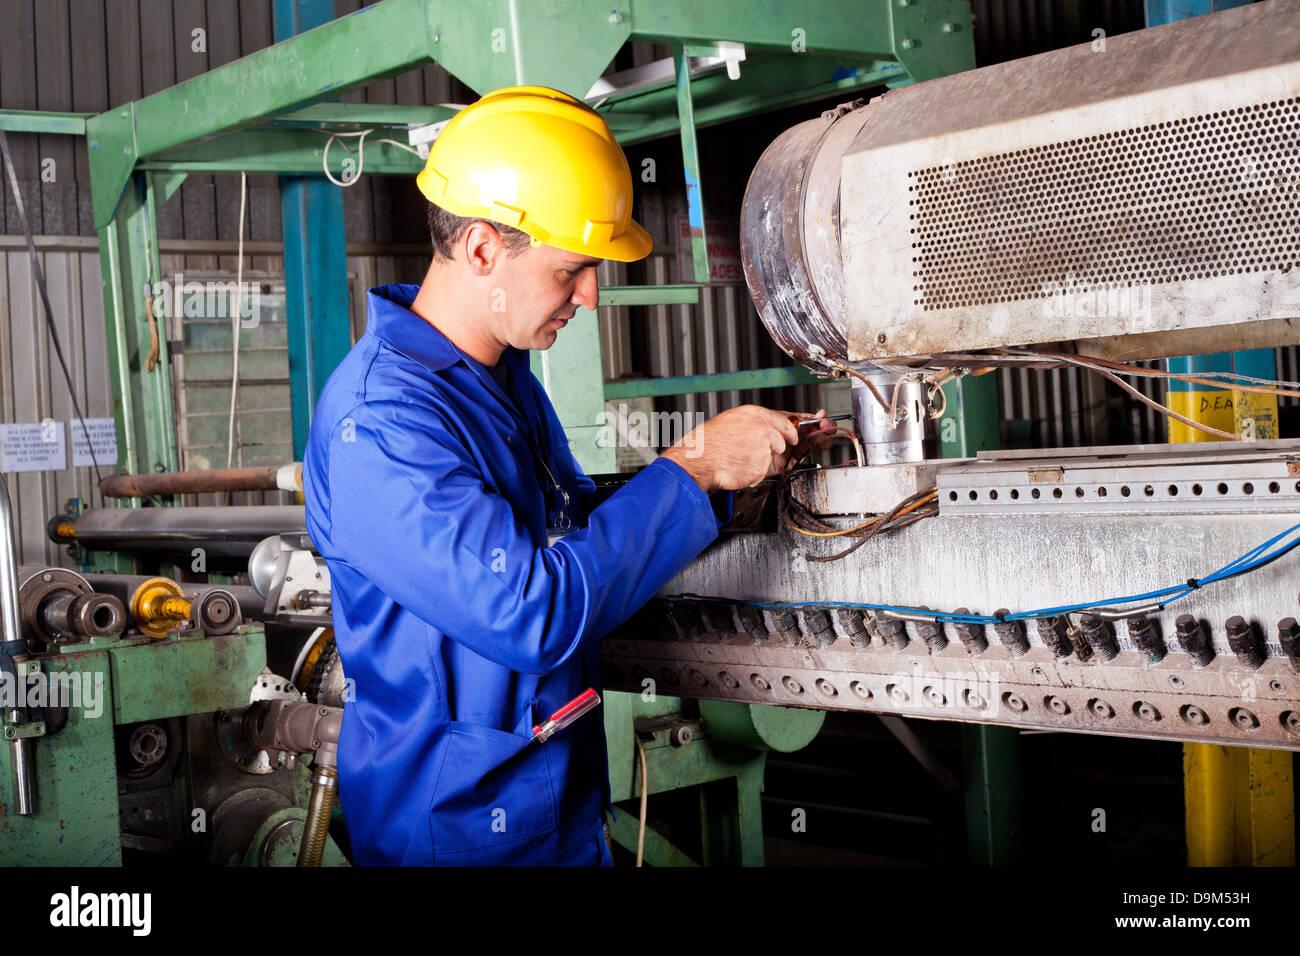 industrial mechanic repairing heavy industry machine in plant - Stock Image